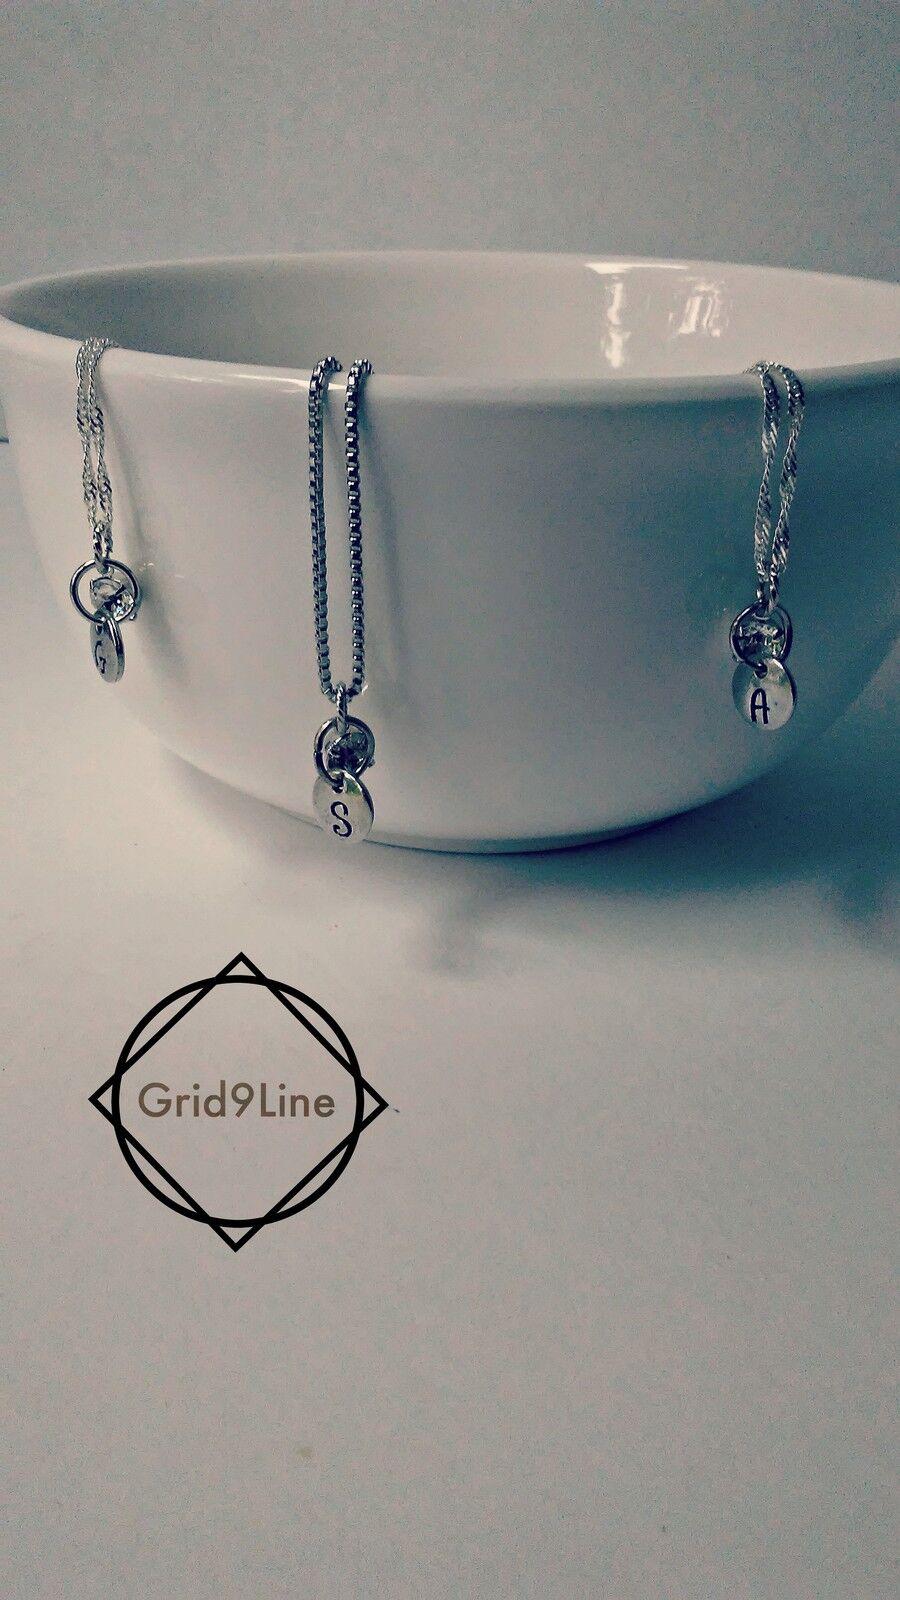 gridnineline